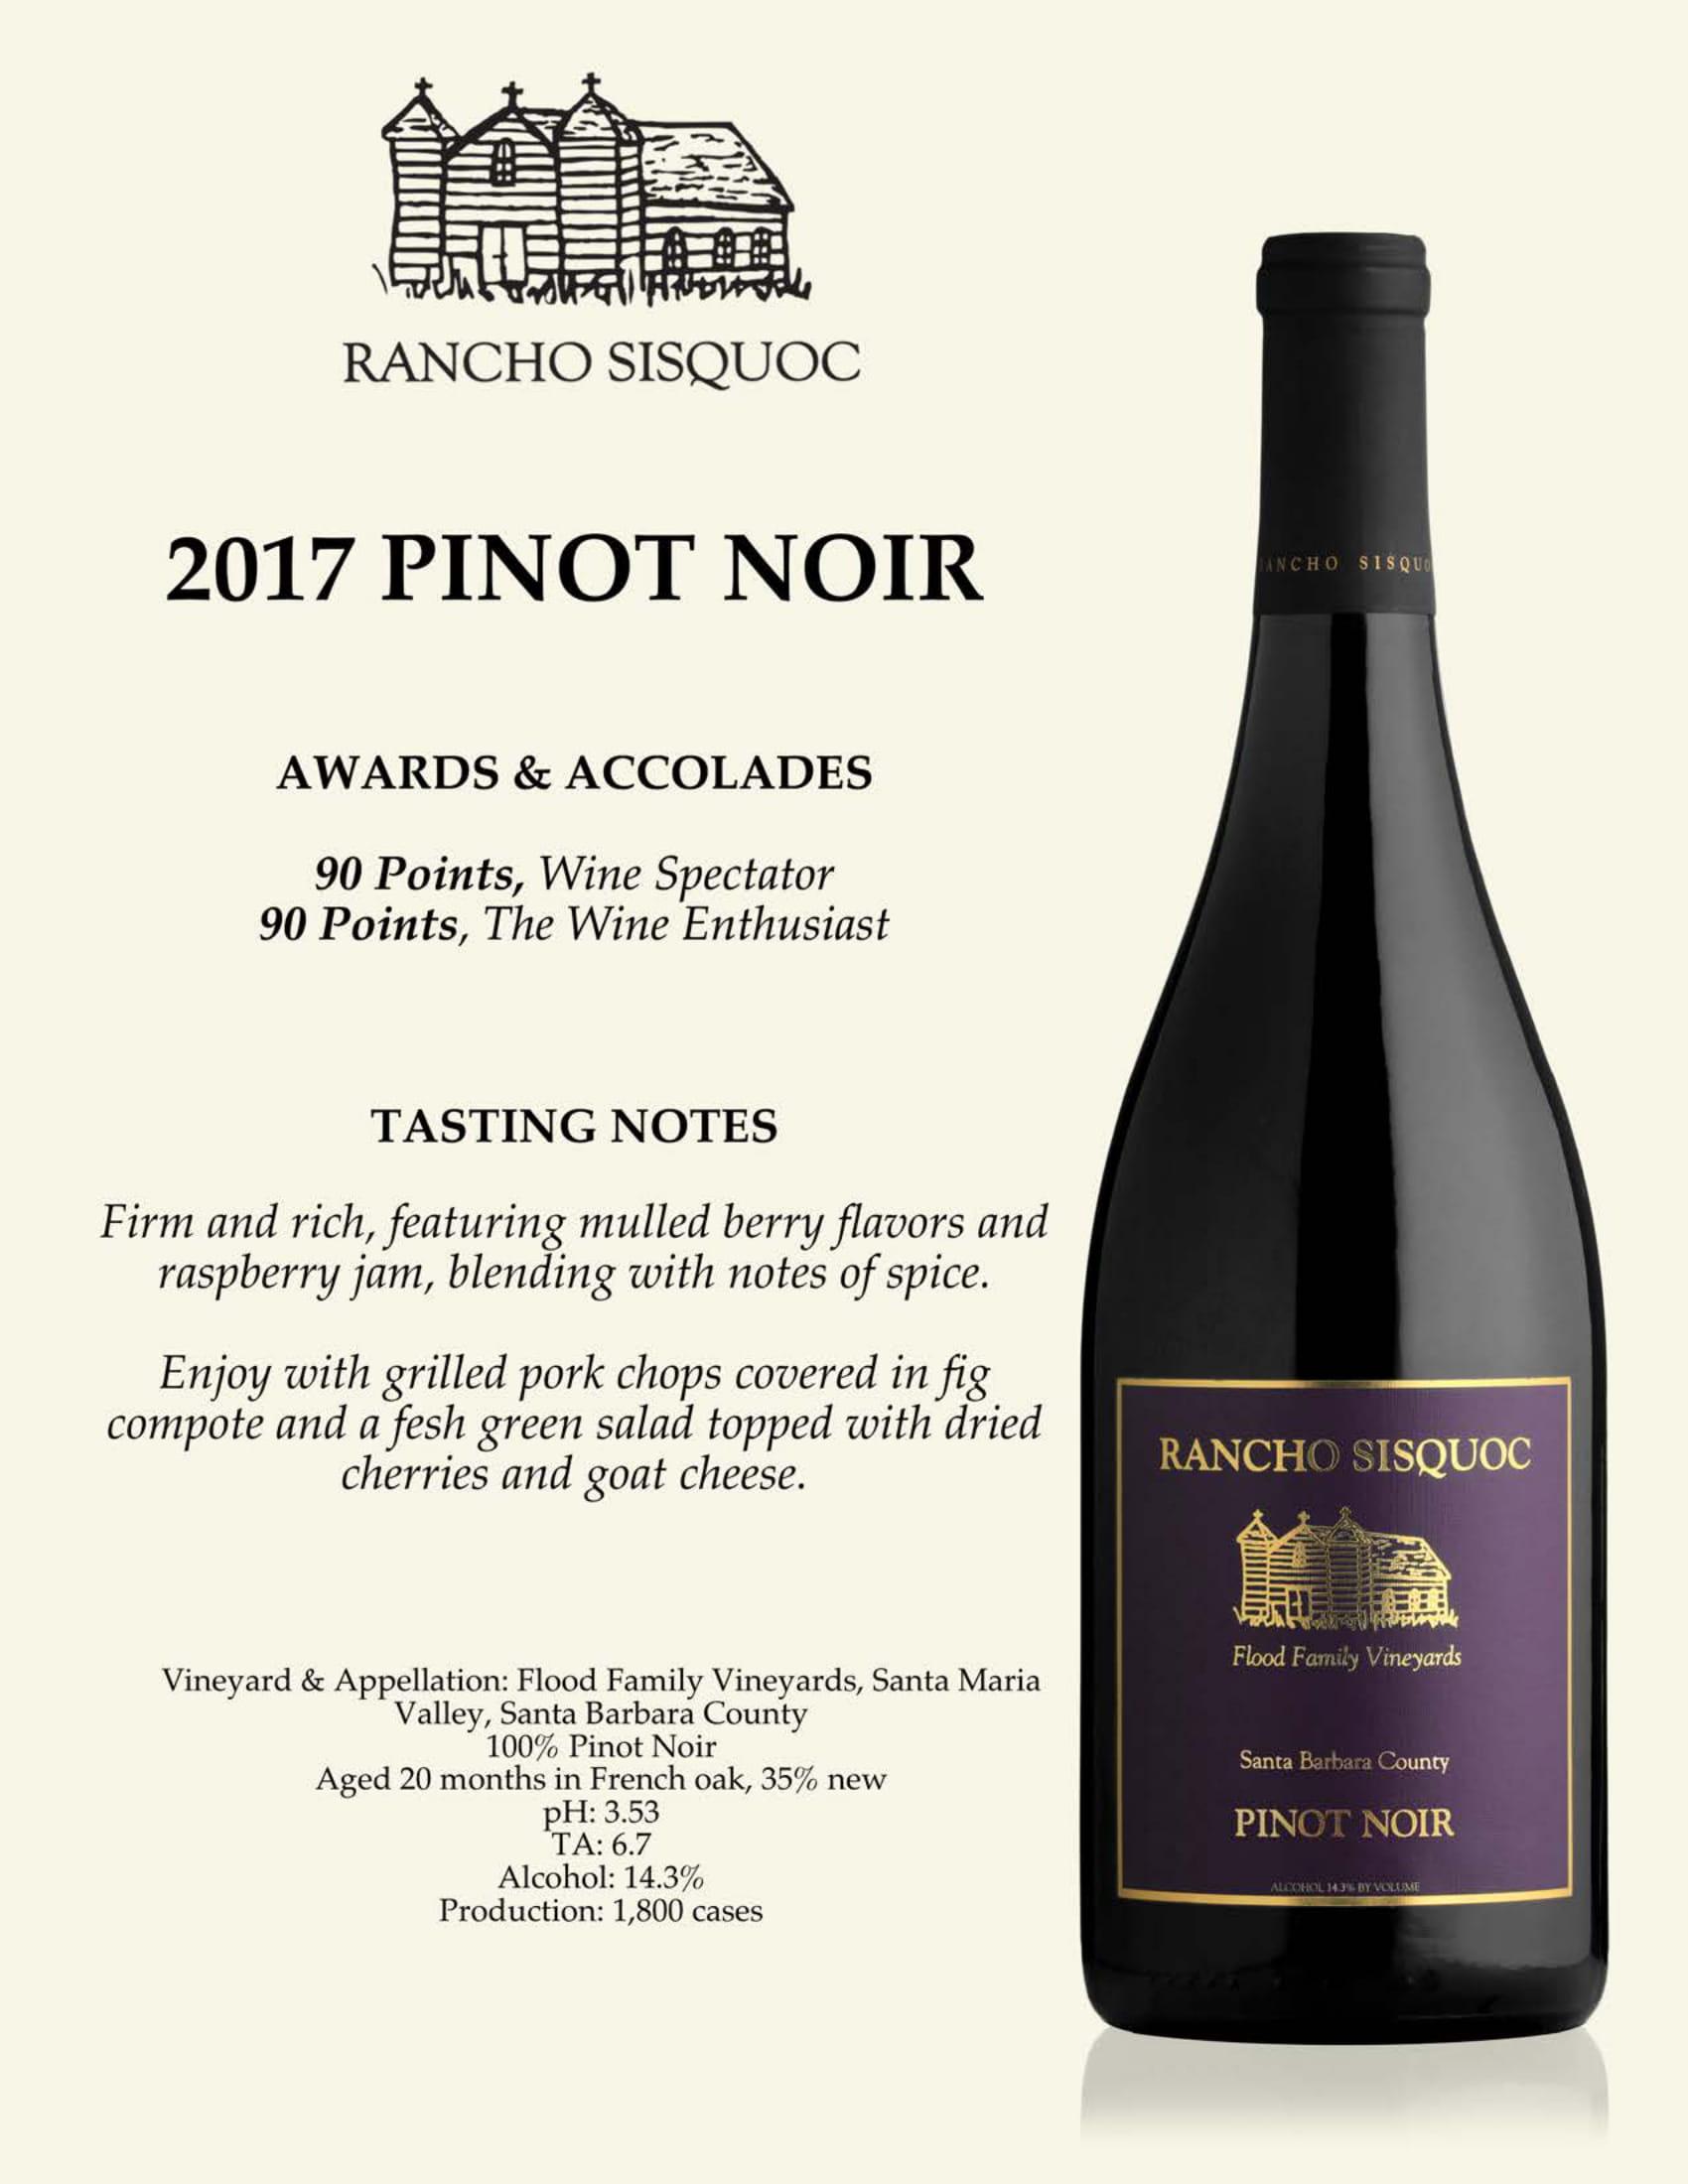 Rancho Sisquoc Pinot Noir Tech Sheet